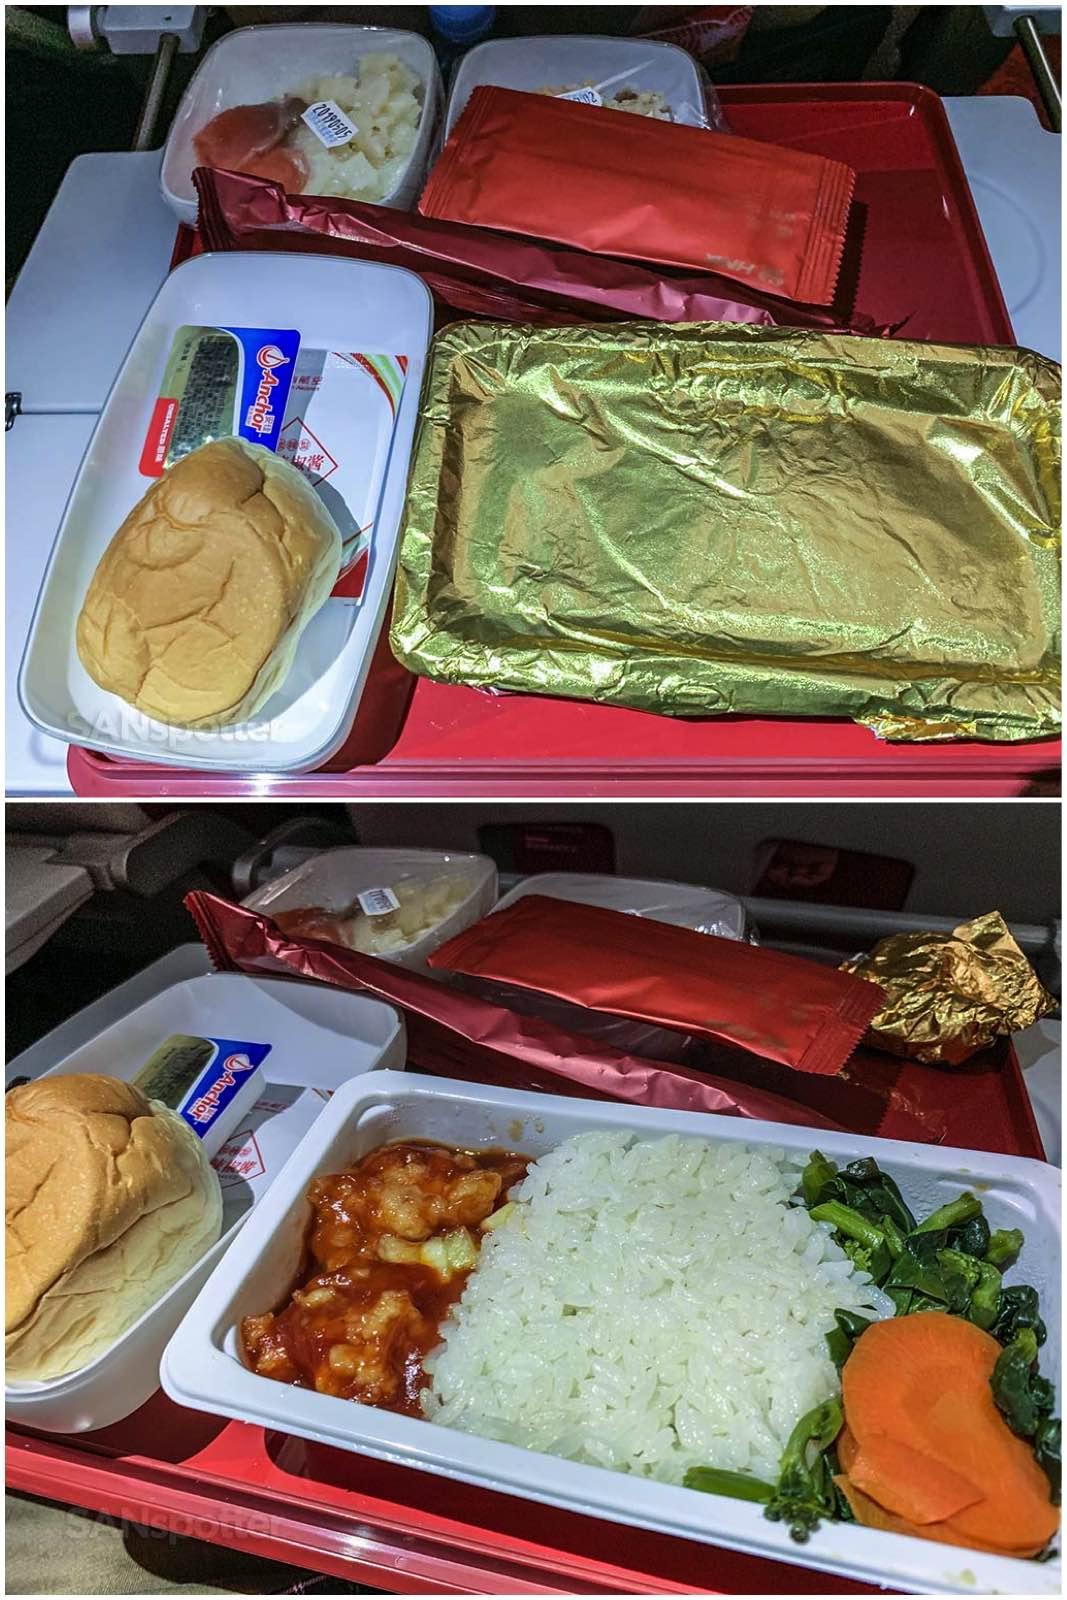 Hainan economy class meal